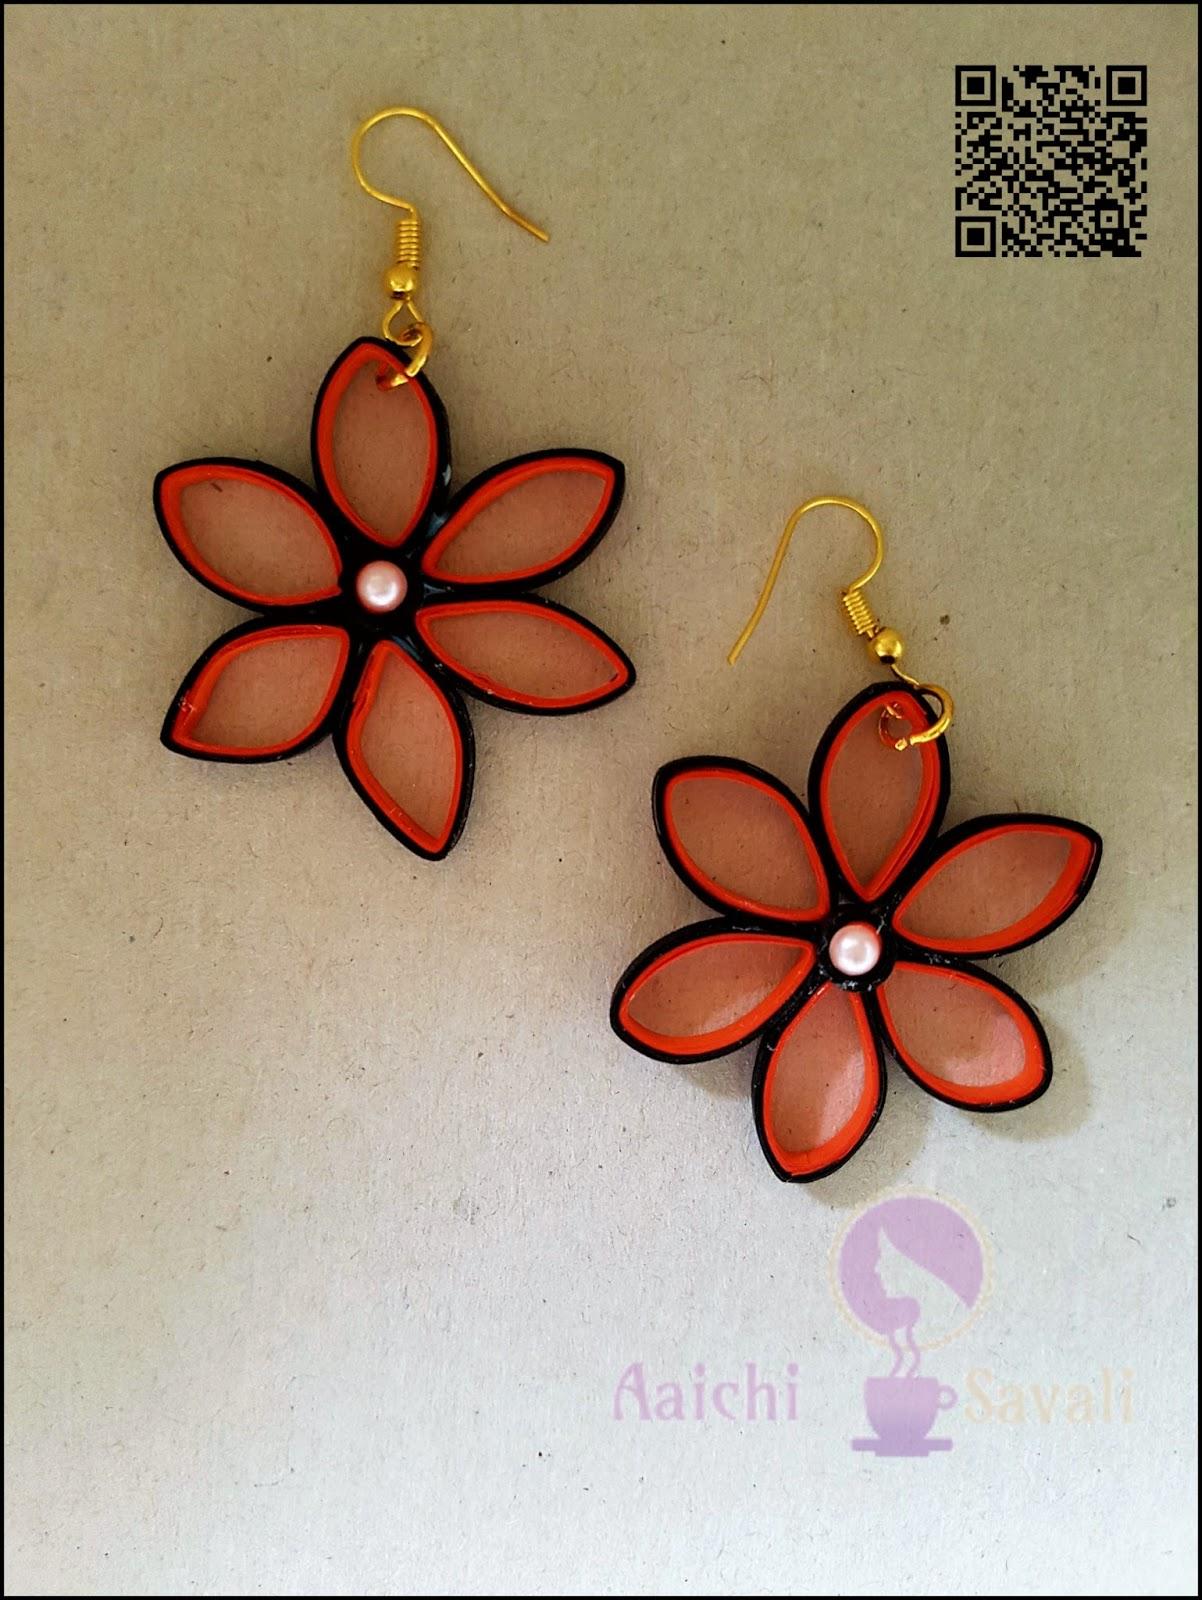 a88ec4e26 quilling paper flower earrings - Cablo.commongroundsapex.co